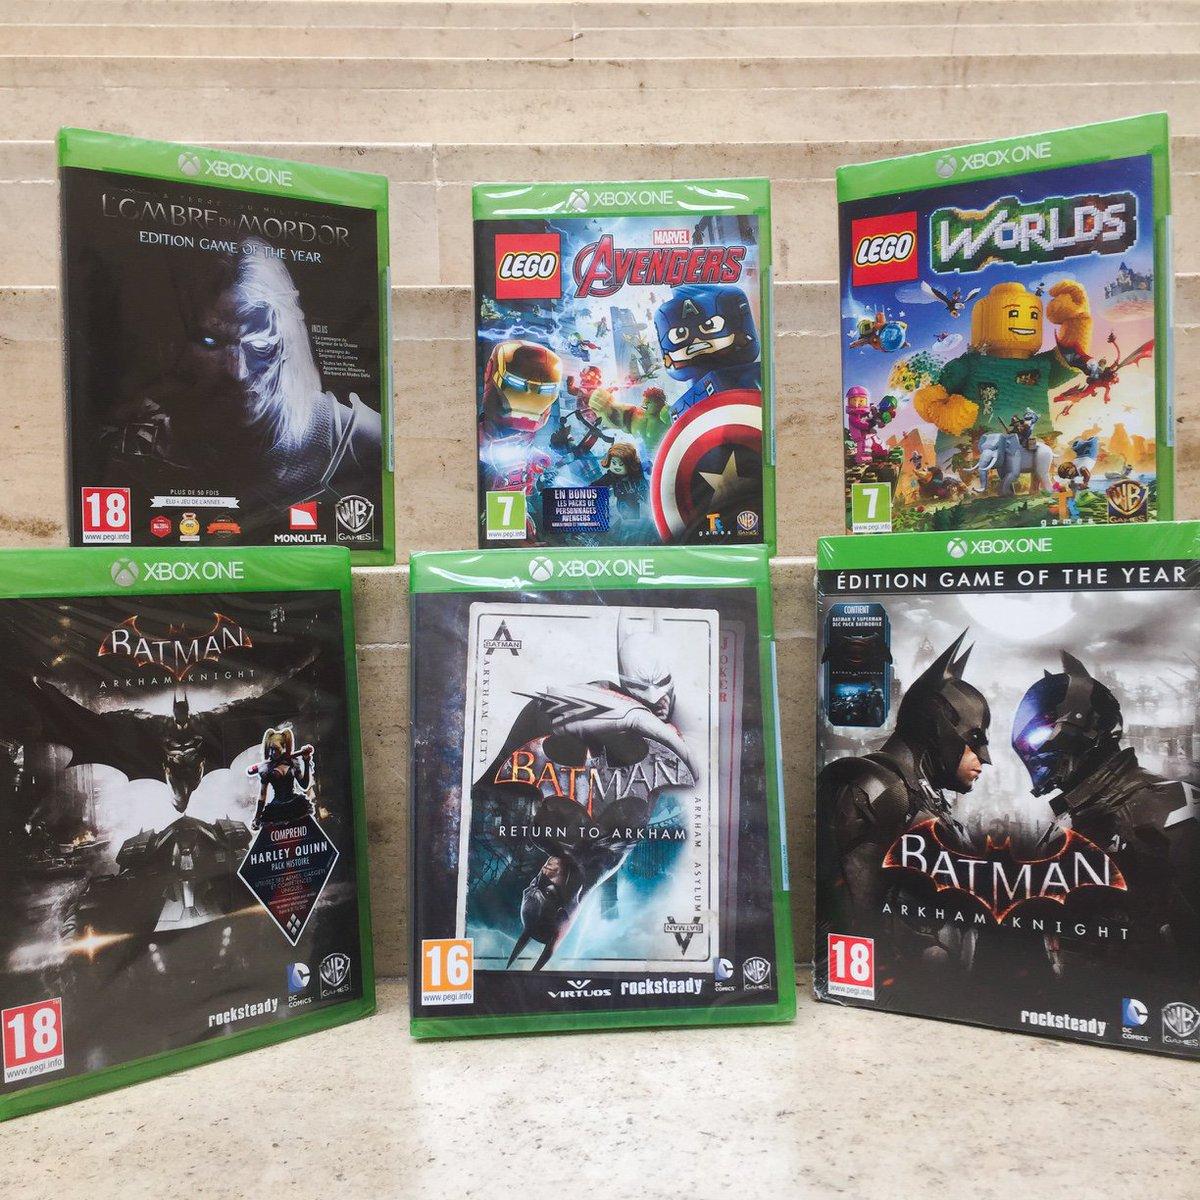 Warner Bros France On Twitter Bon Anniversaire At Xboxfr Pour